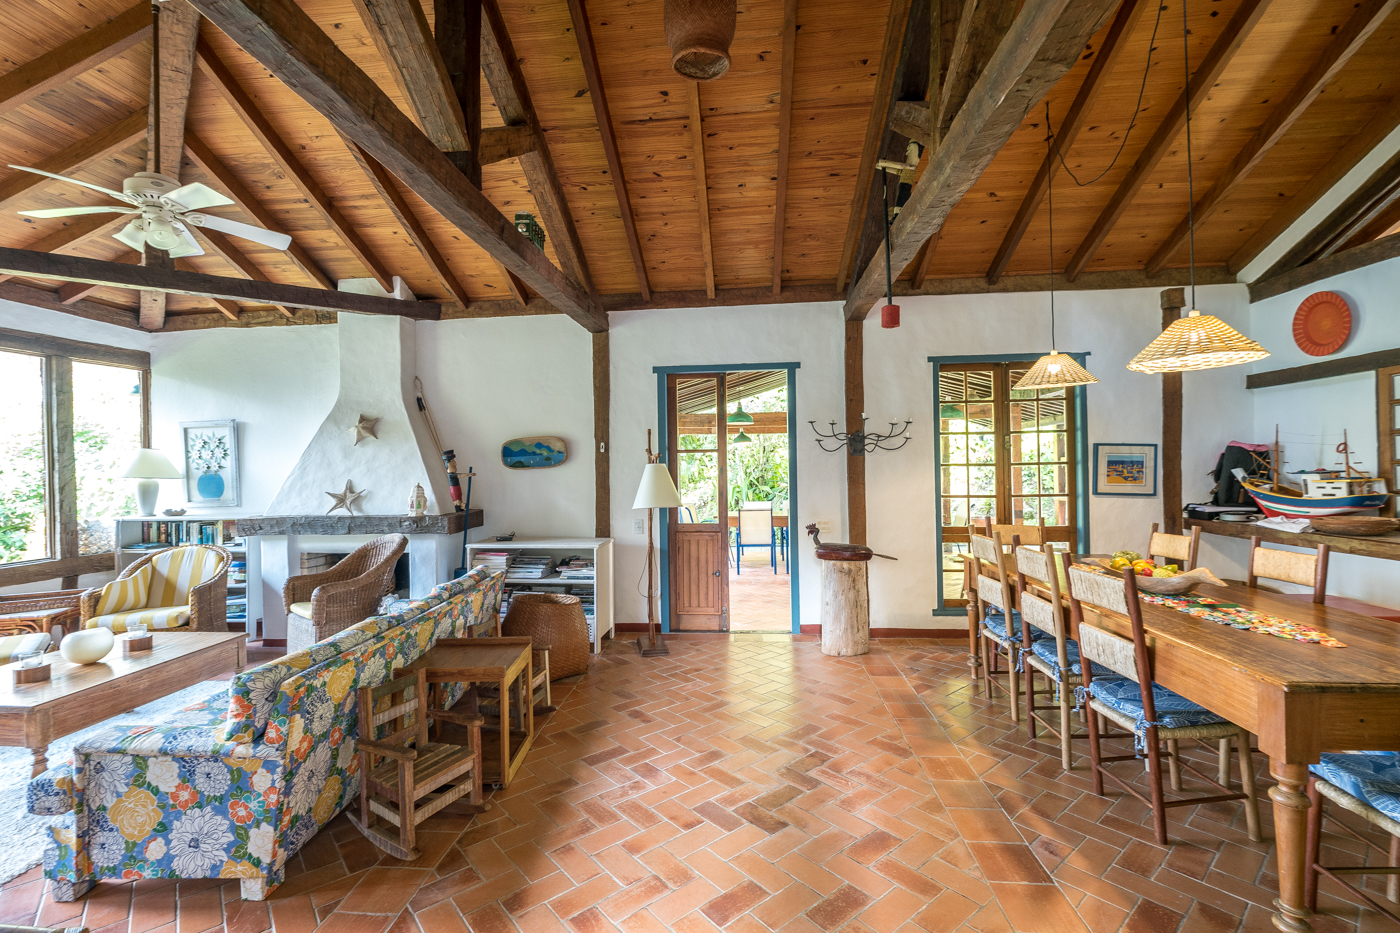 Ubatuba_airbnb-63.jpg